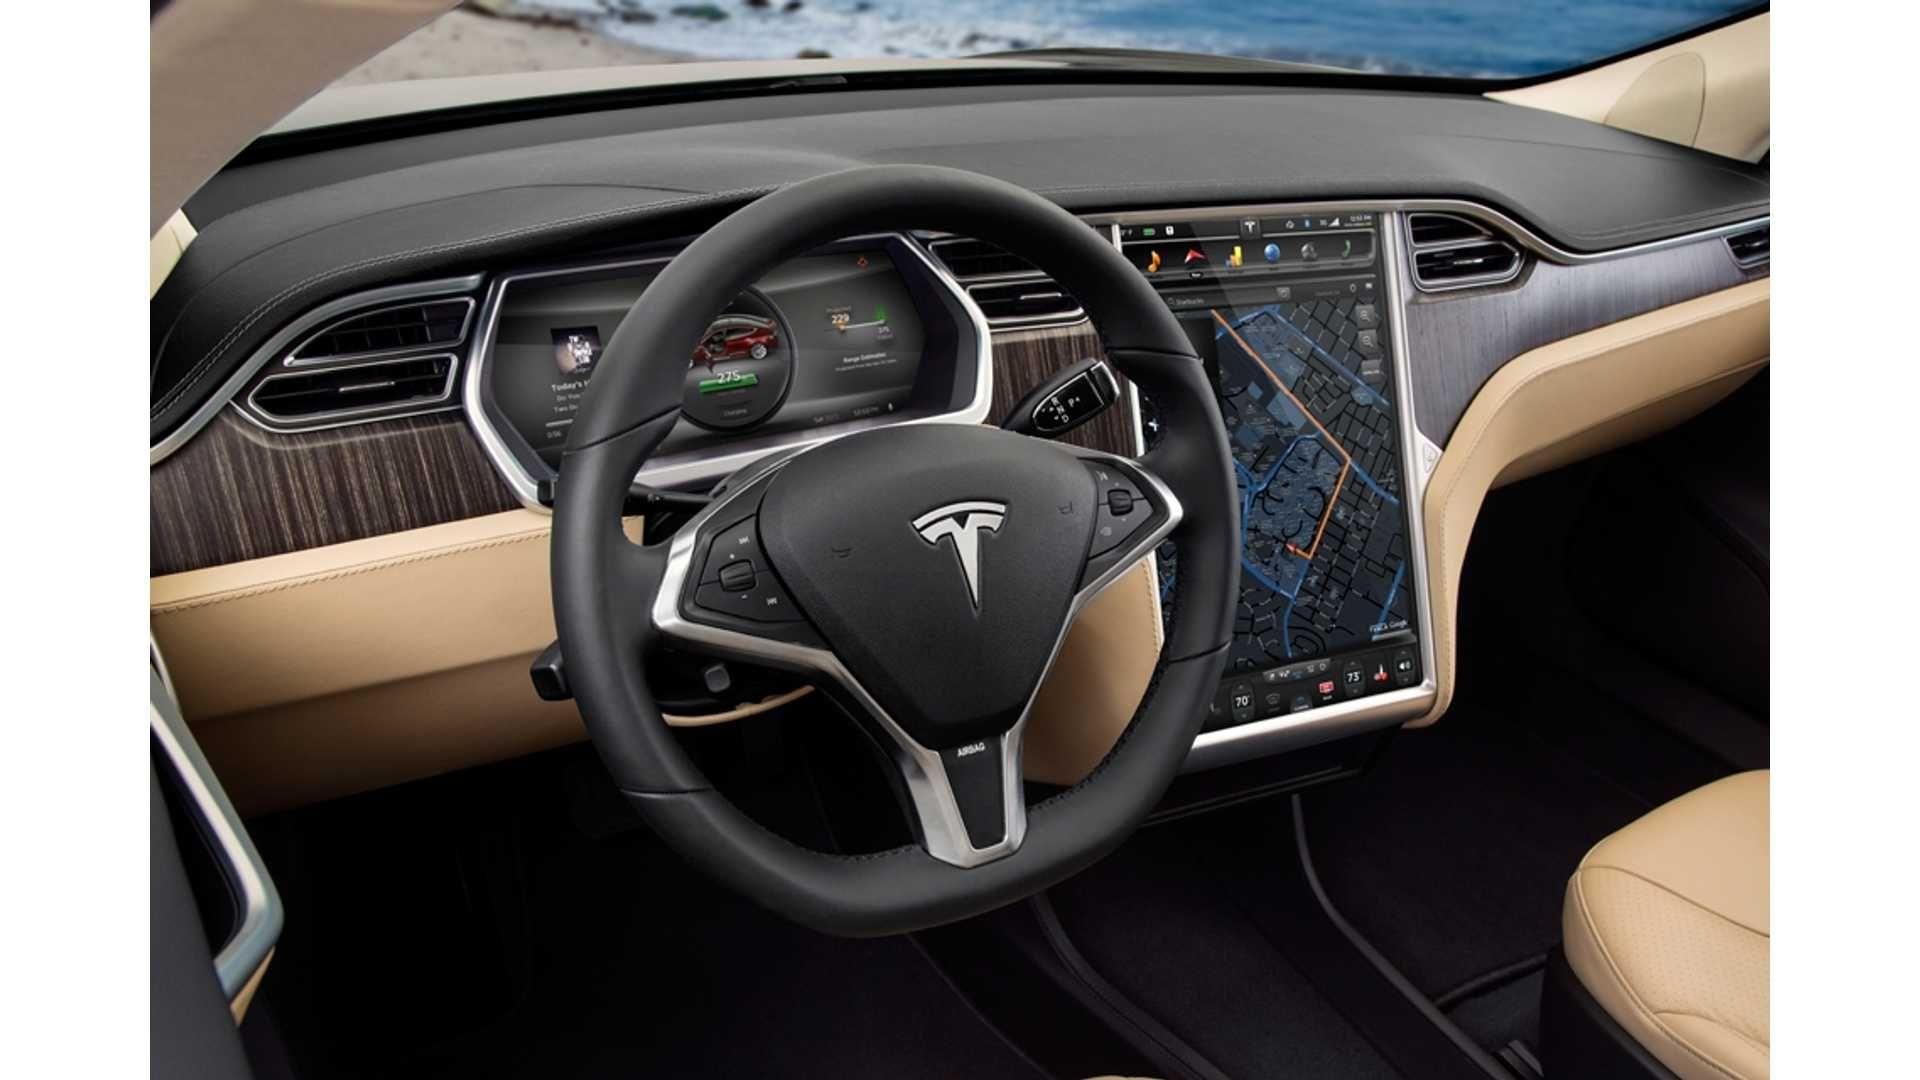 Tesla Model S Interior Flawed Here Are The Fixes Regarding Tesla Interior Model S Home Design Ideas Nel 2020 Tesla Sfida Auto